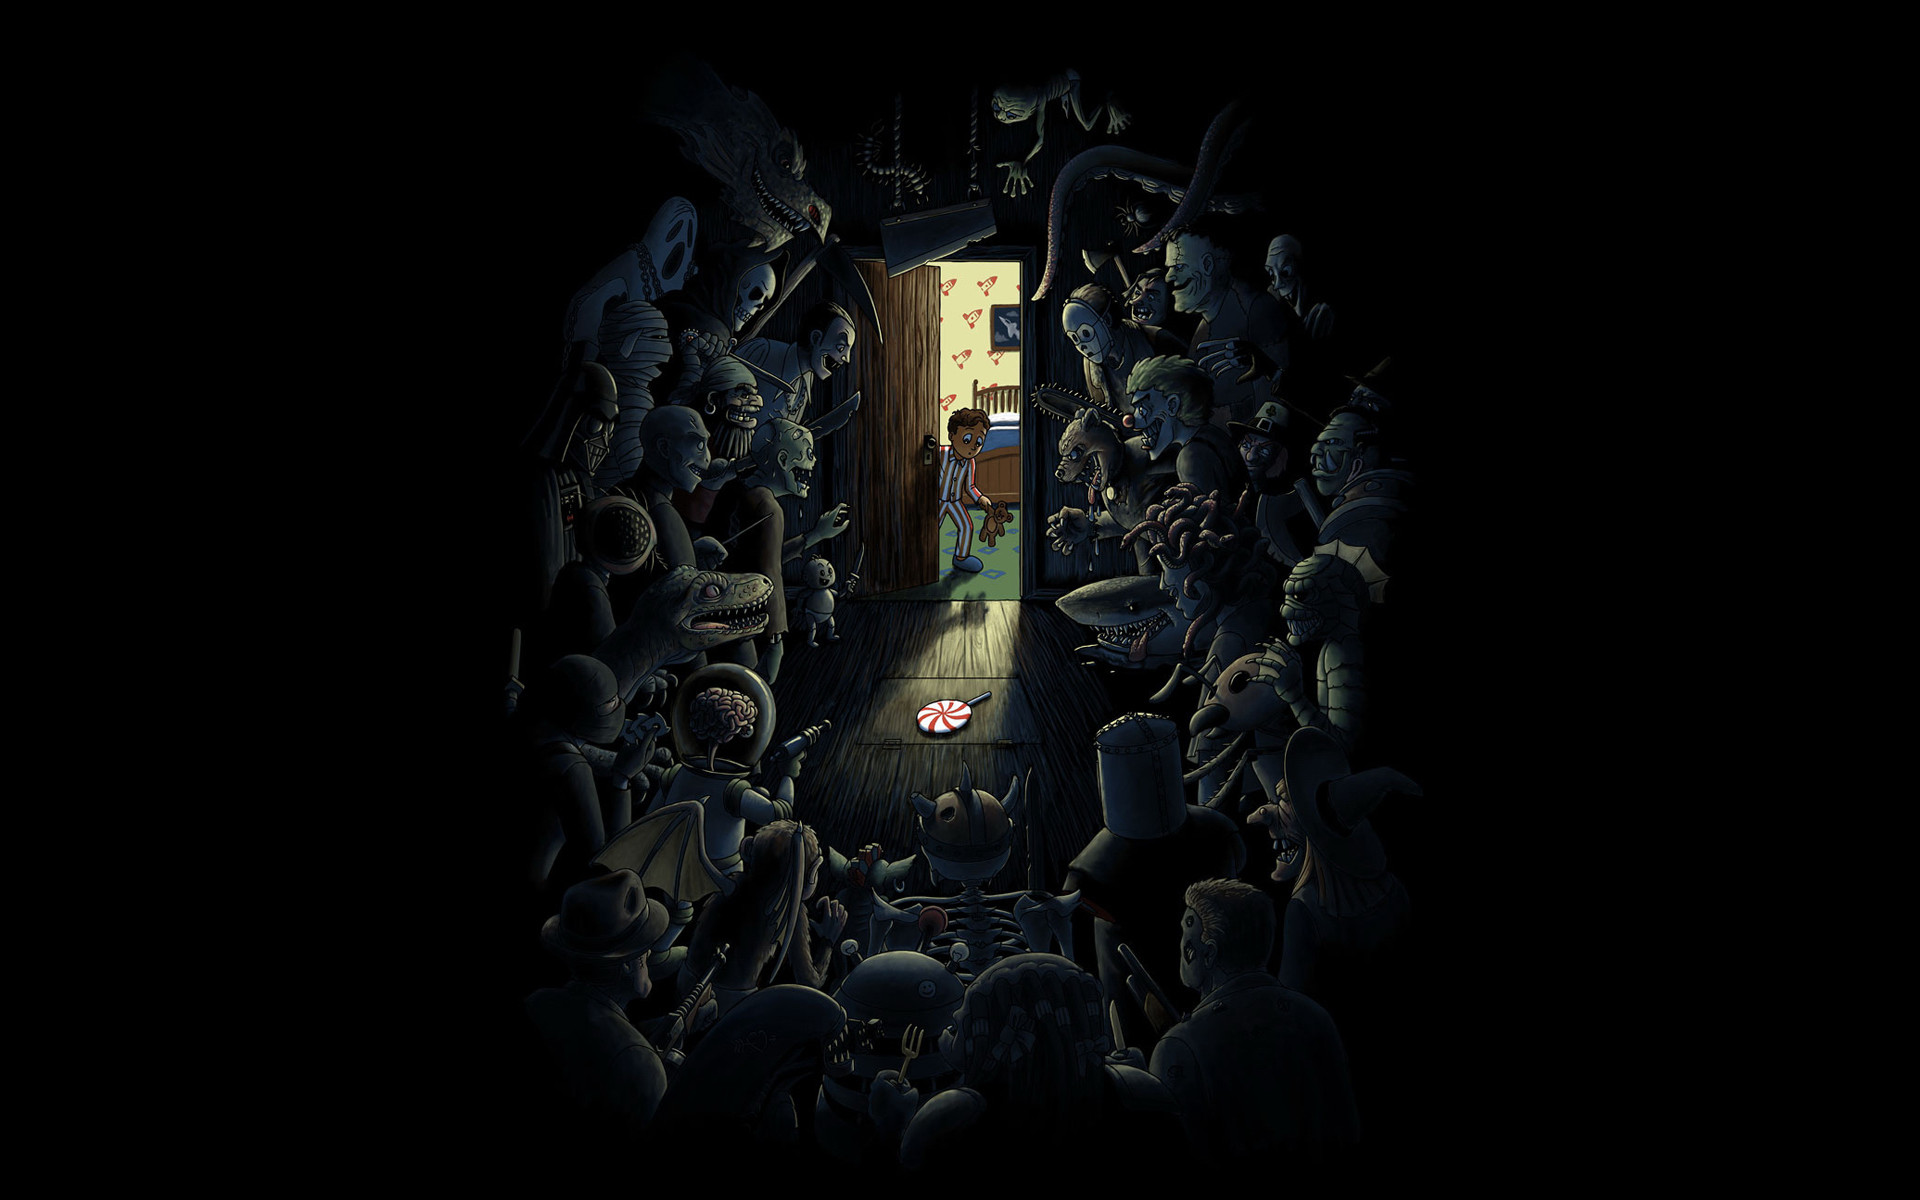 Dark – Scary Comics Child Monster Wallpaper